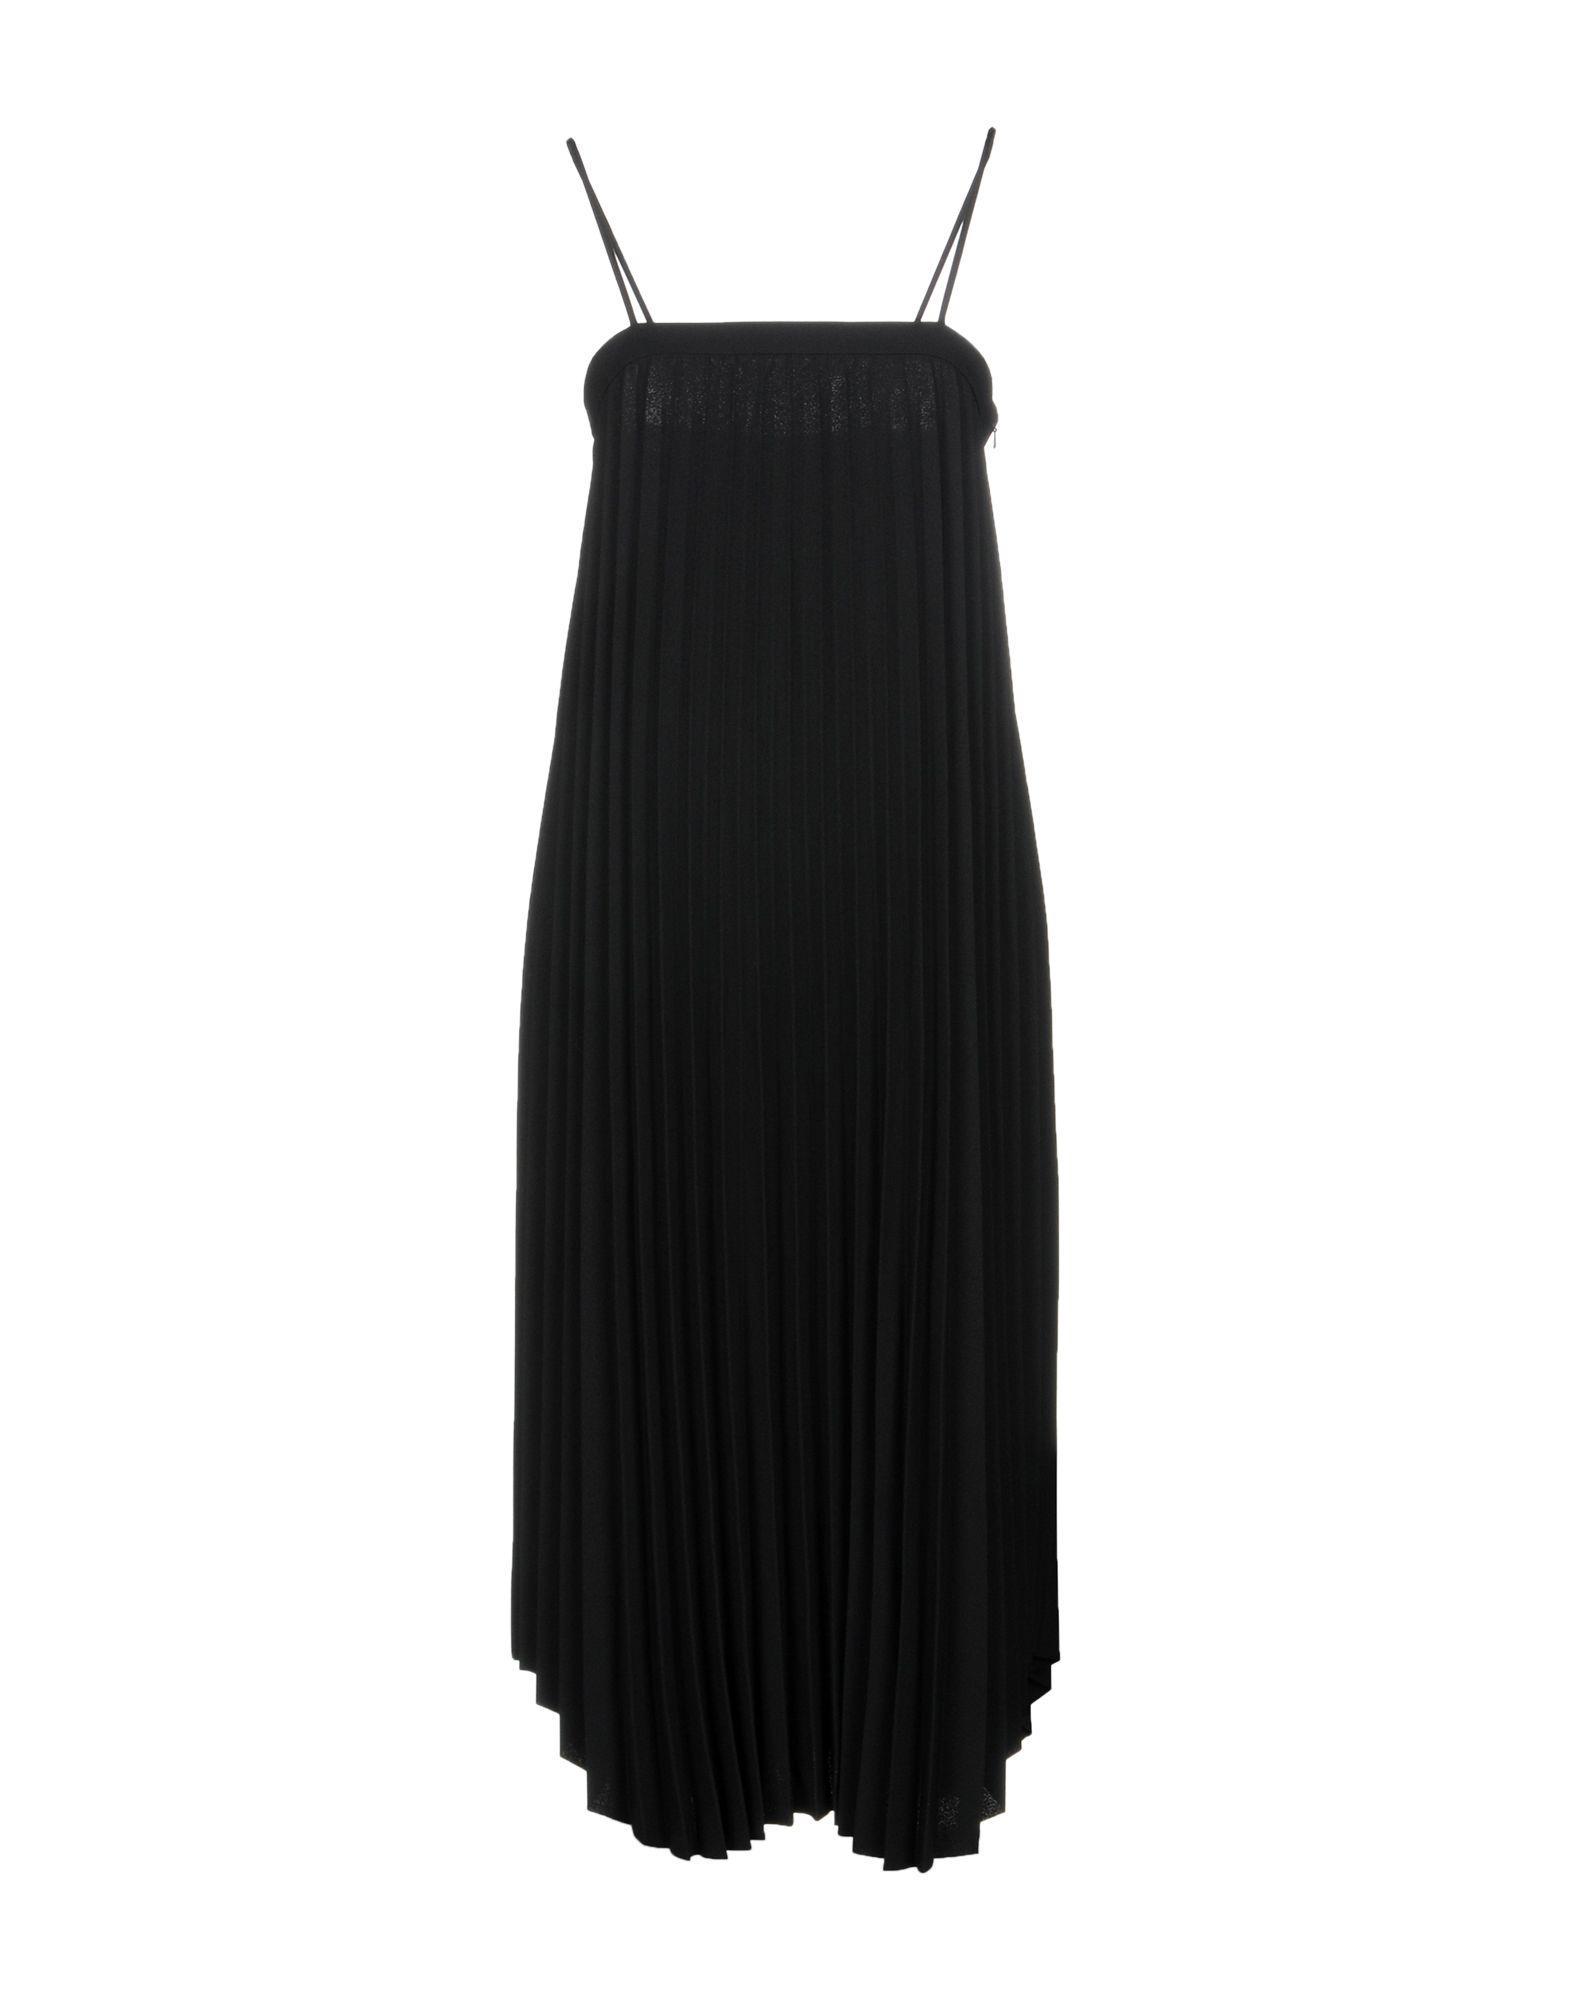 Filippa K Knee-length Dresses In Black